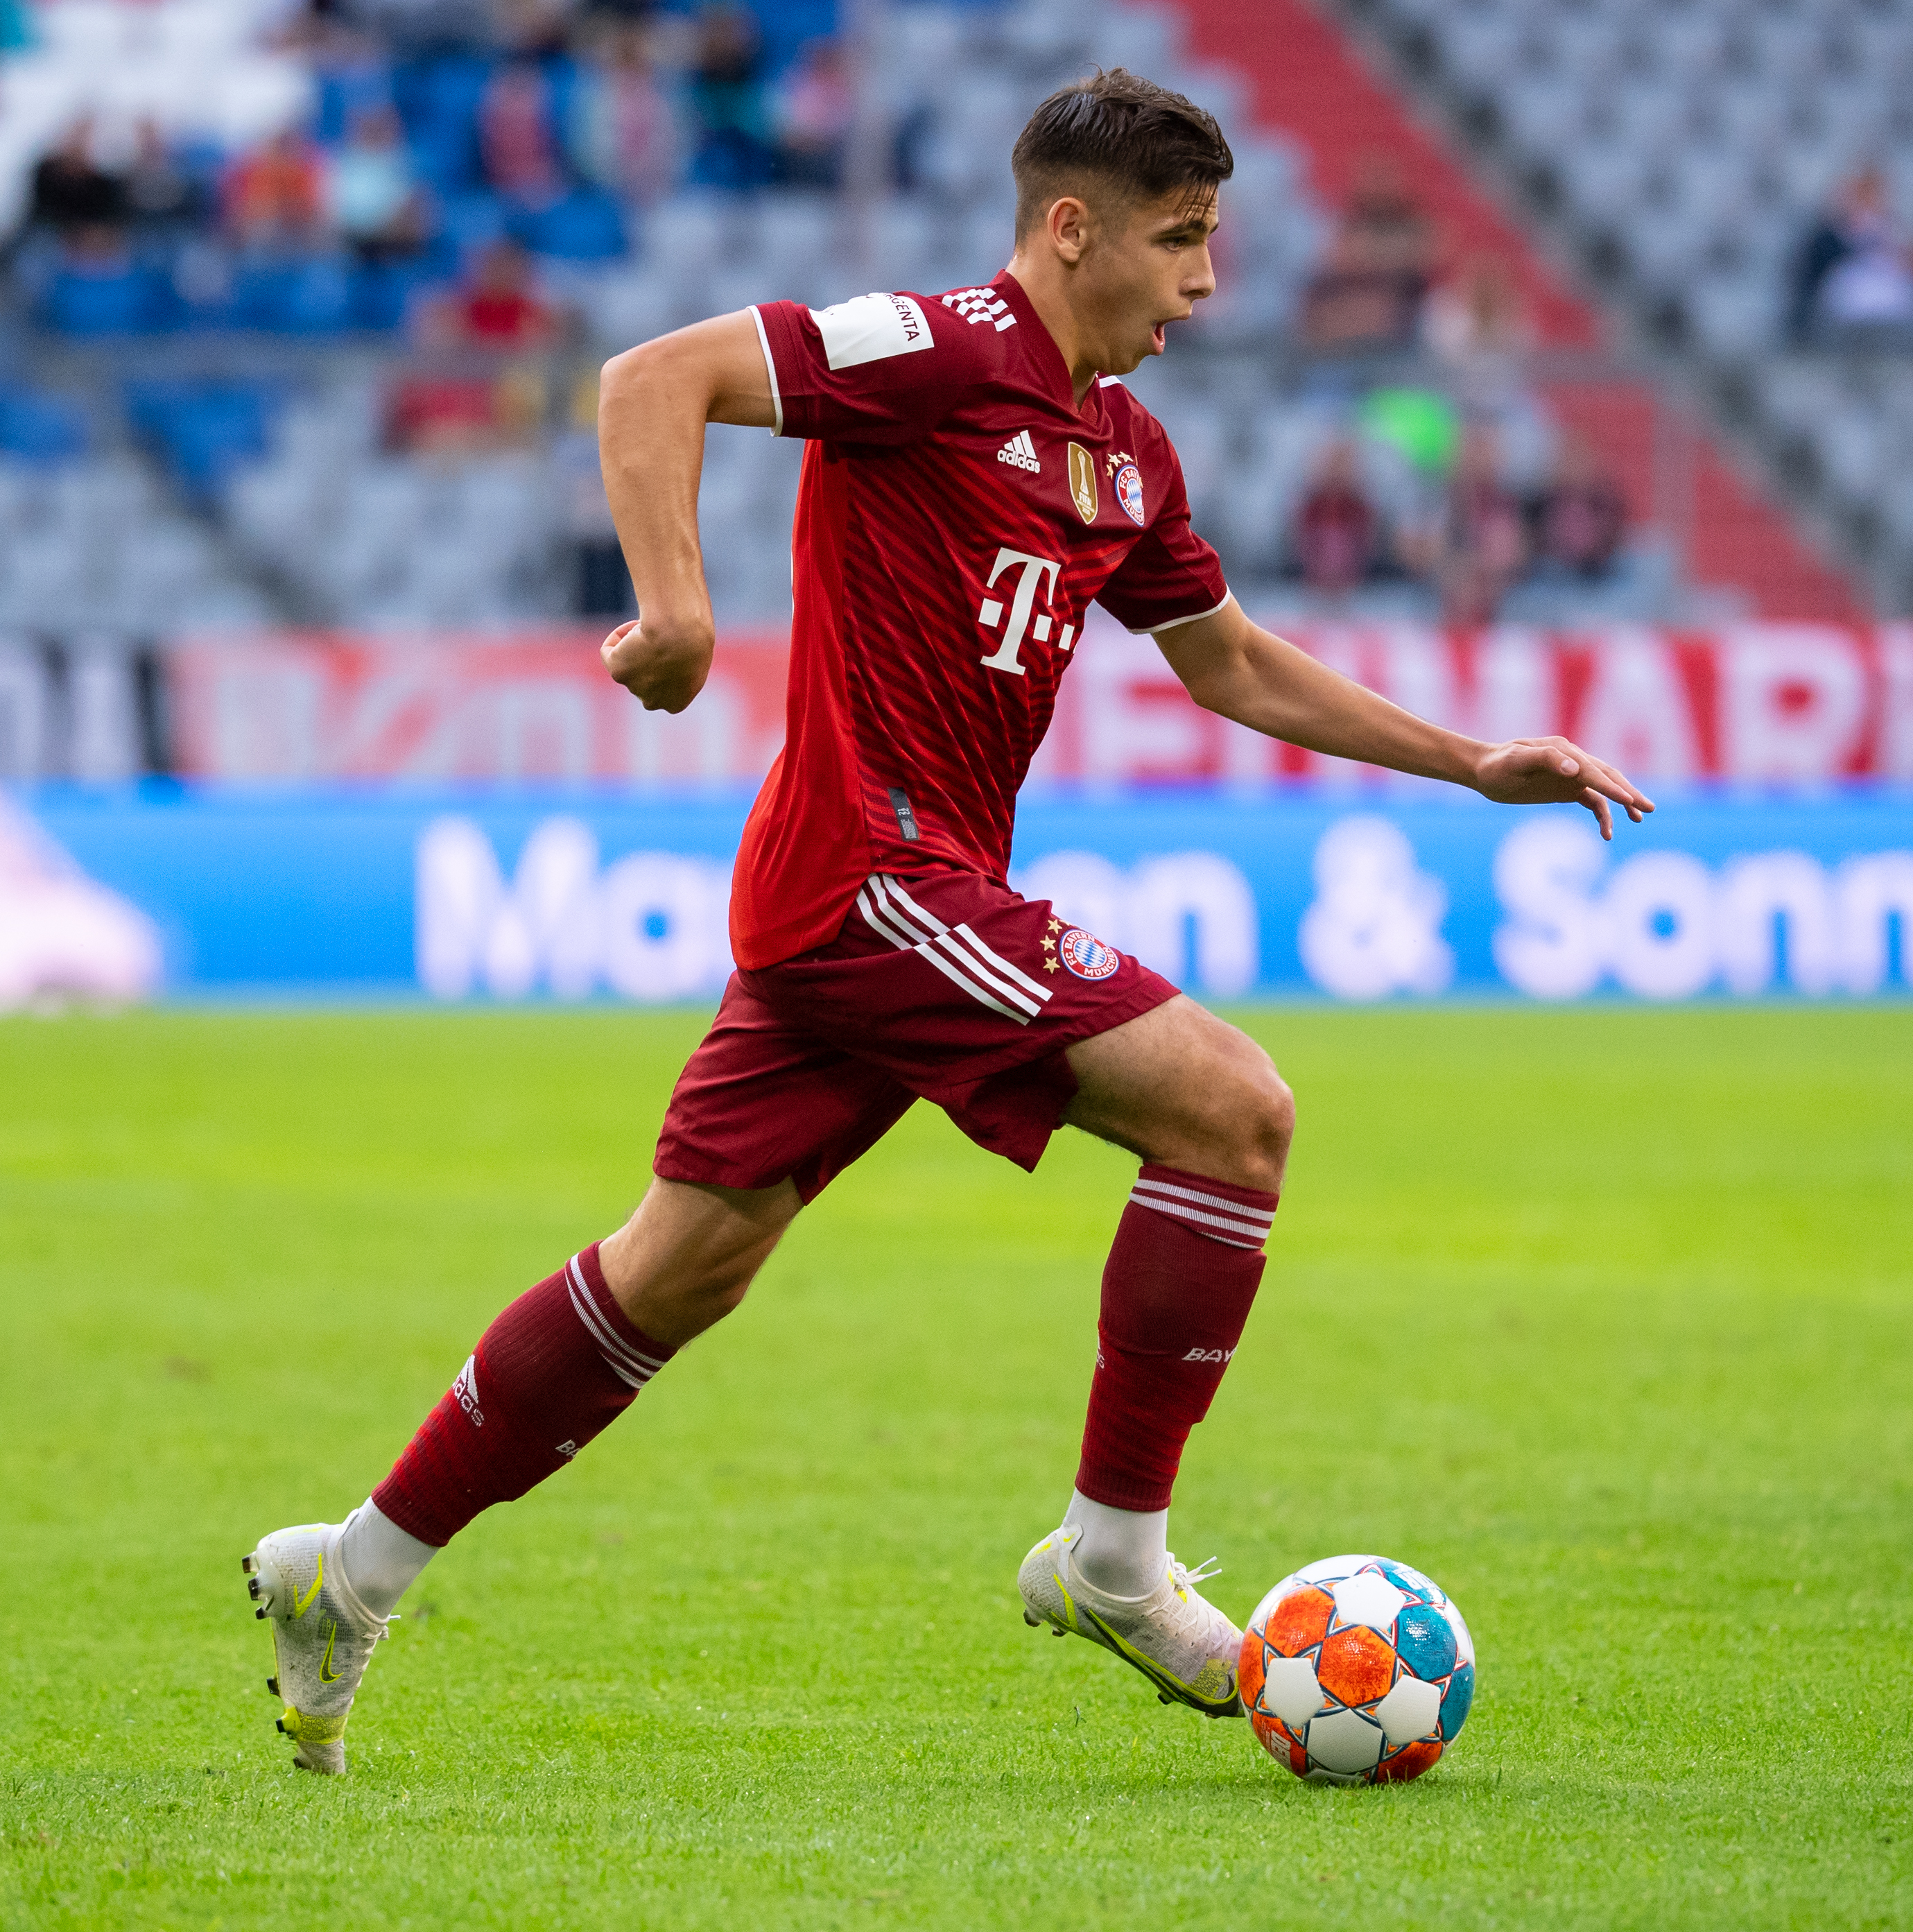 FC Bayern Munich - Borussia Mönchengladbach